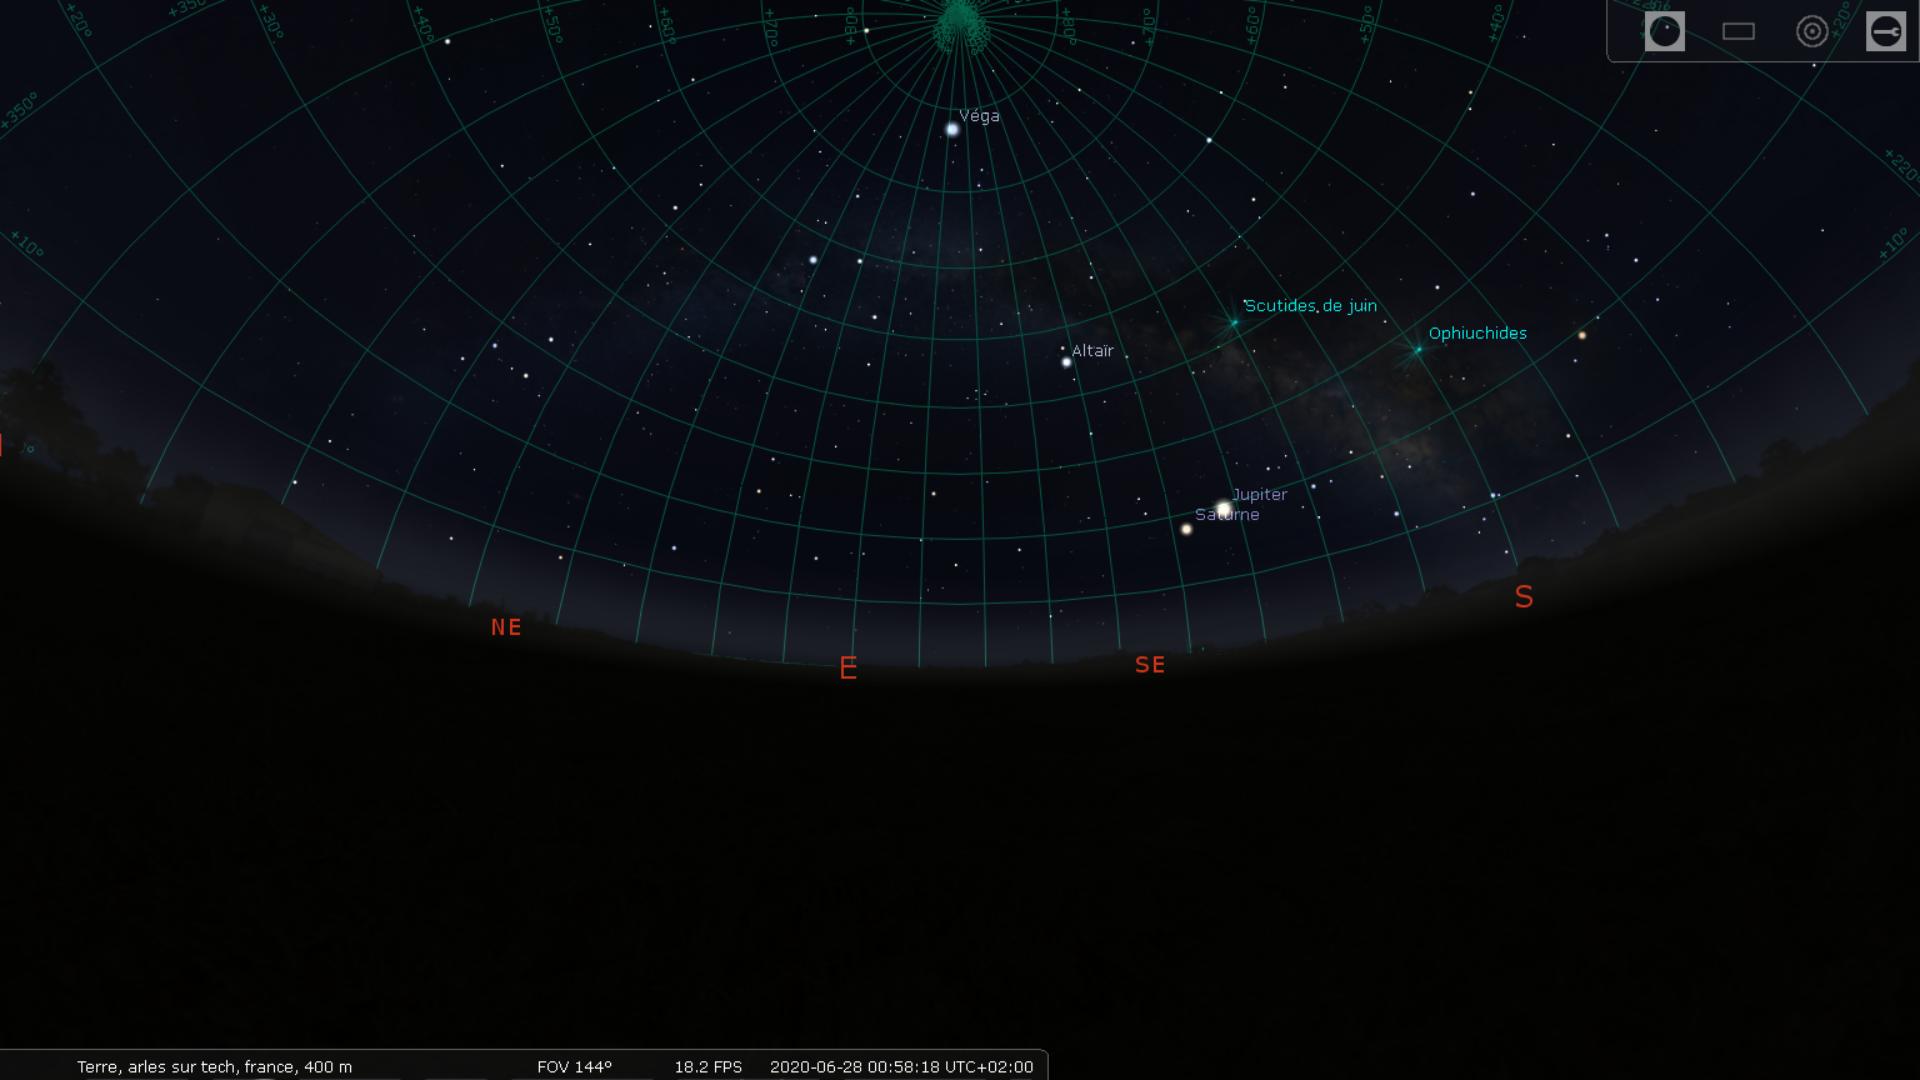 prevision arche galactique - 28 mai 2020 a 3h du matin.PNG